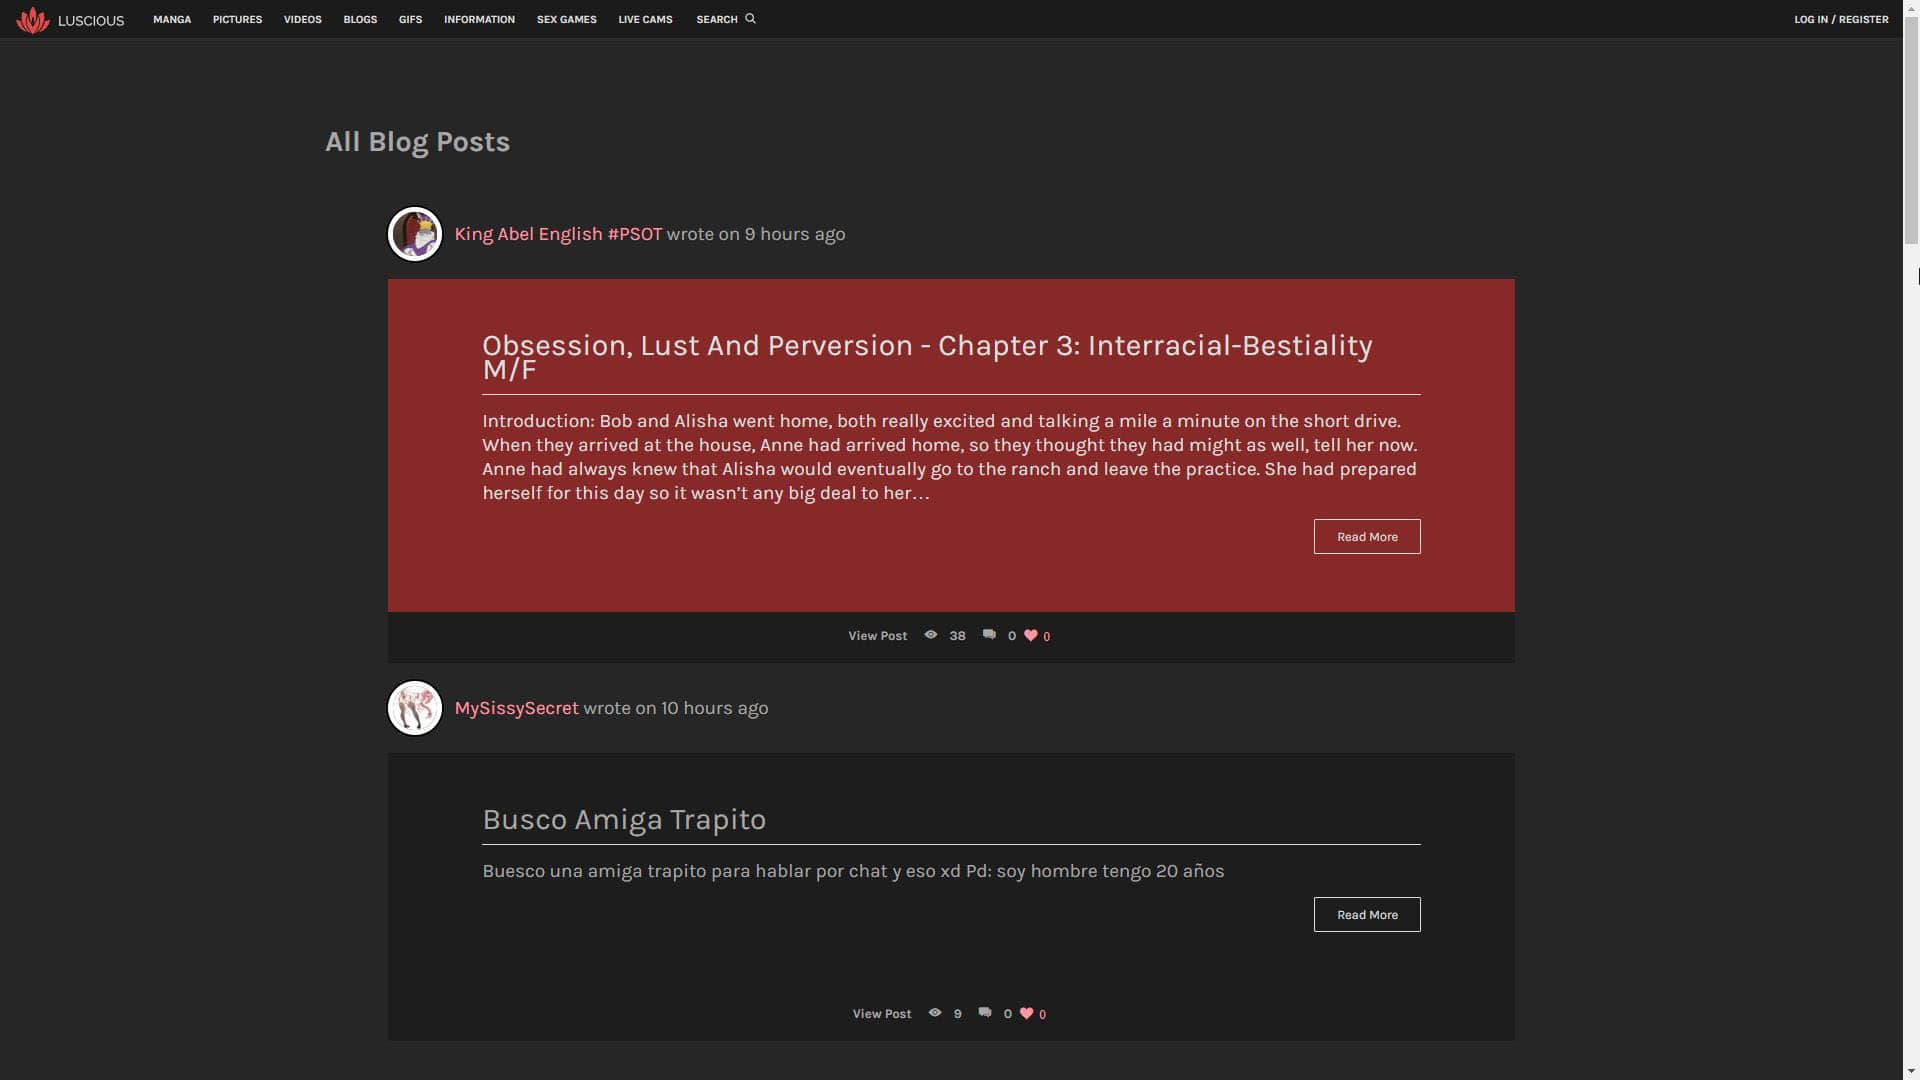 Luscious Blogs